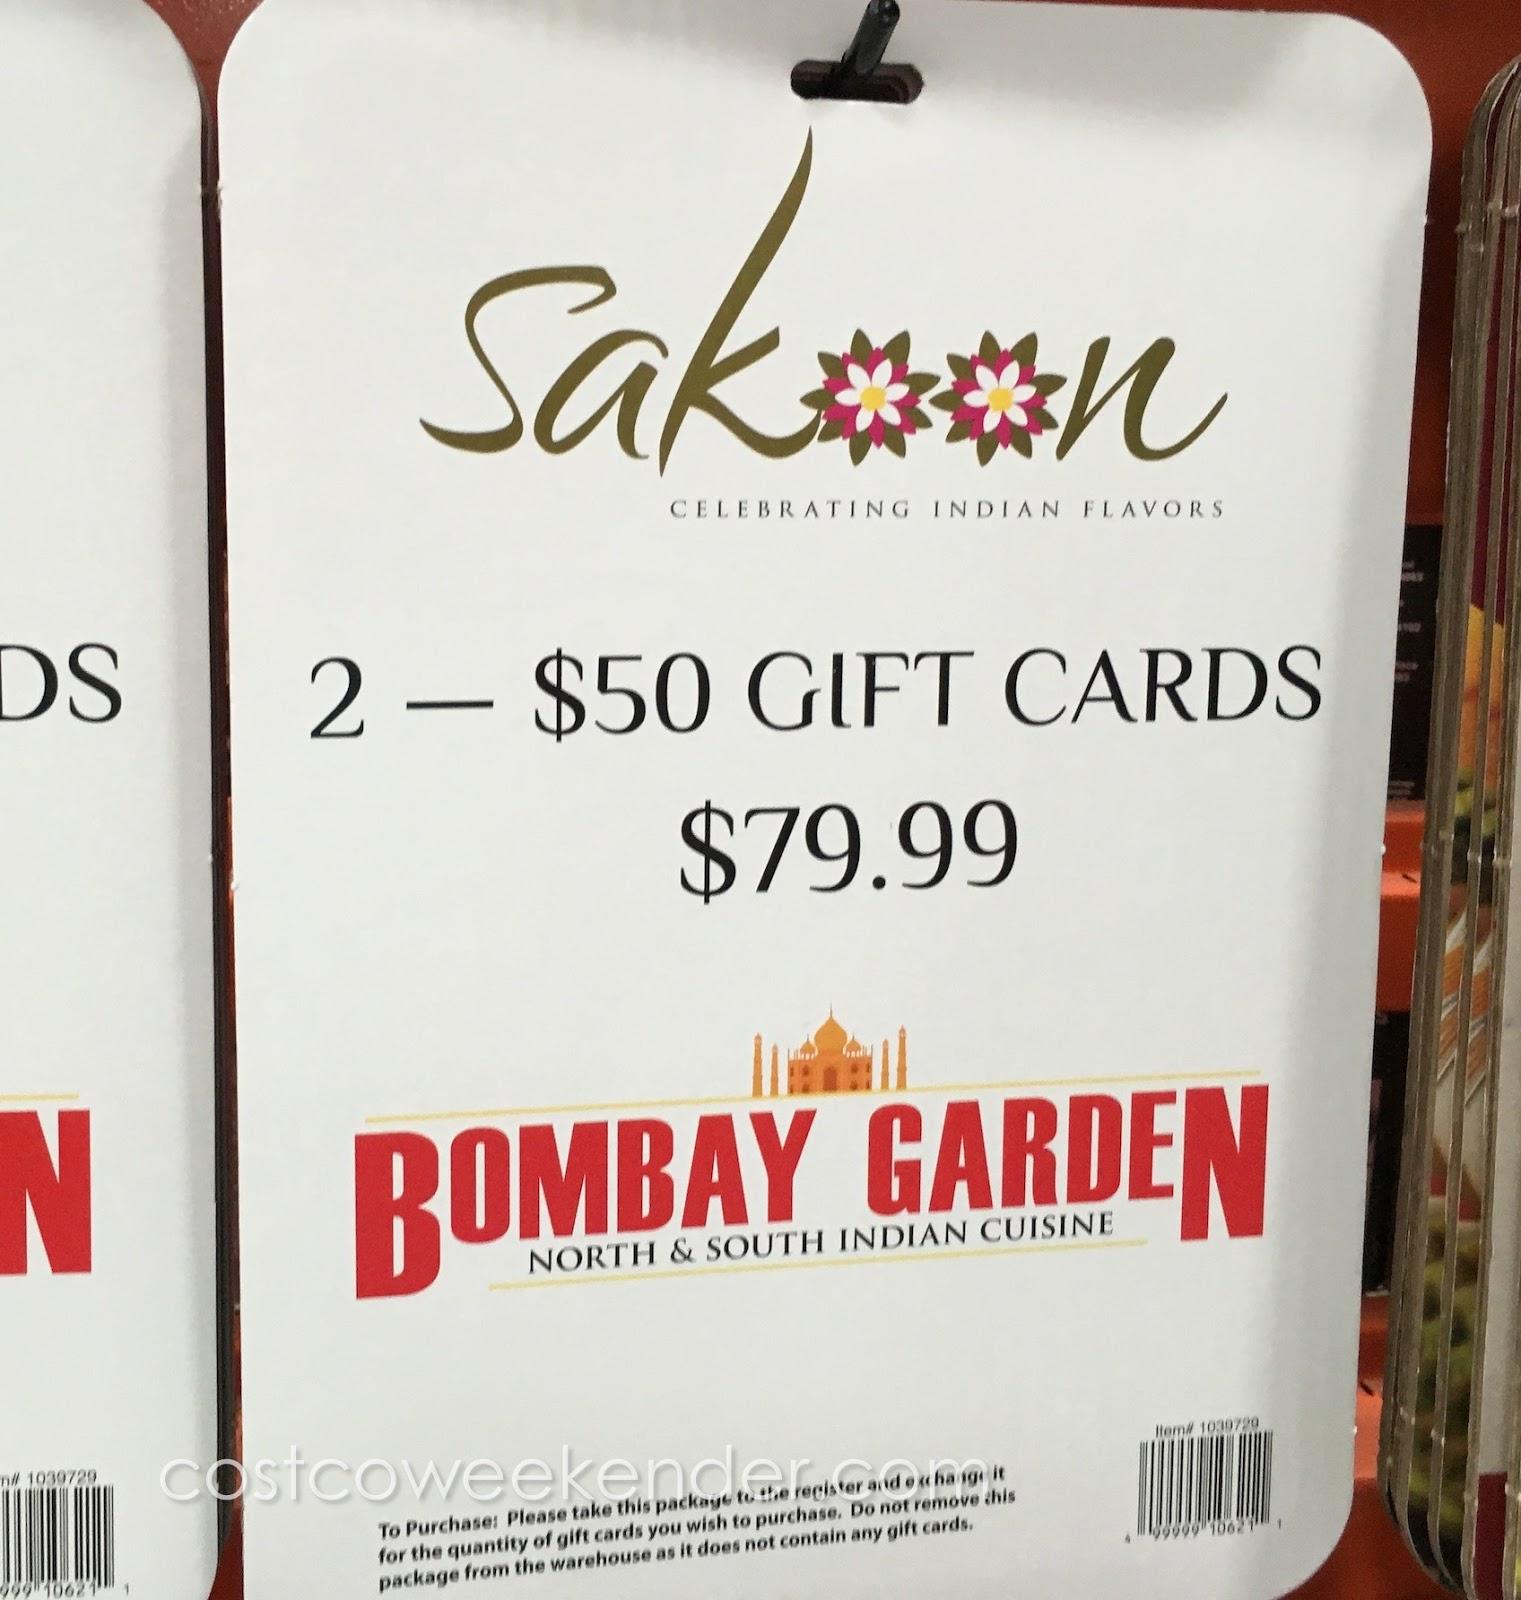 bombay garden sakoon gift cards costco weekender 2 50 gift cards to sakoon or bombay garden for only 79 99